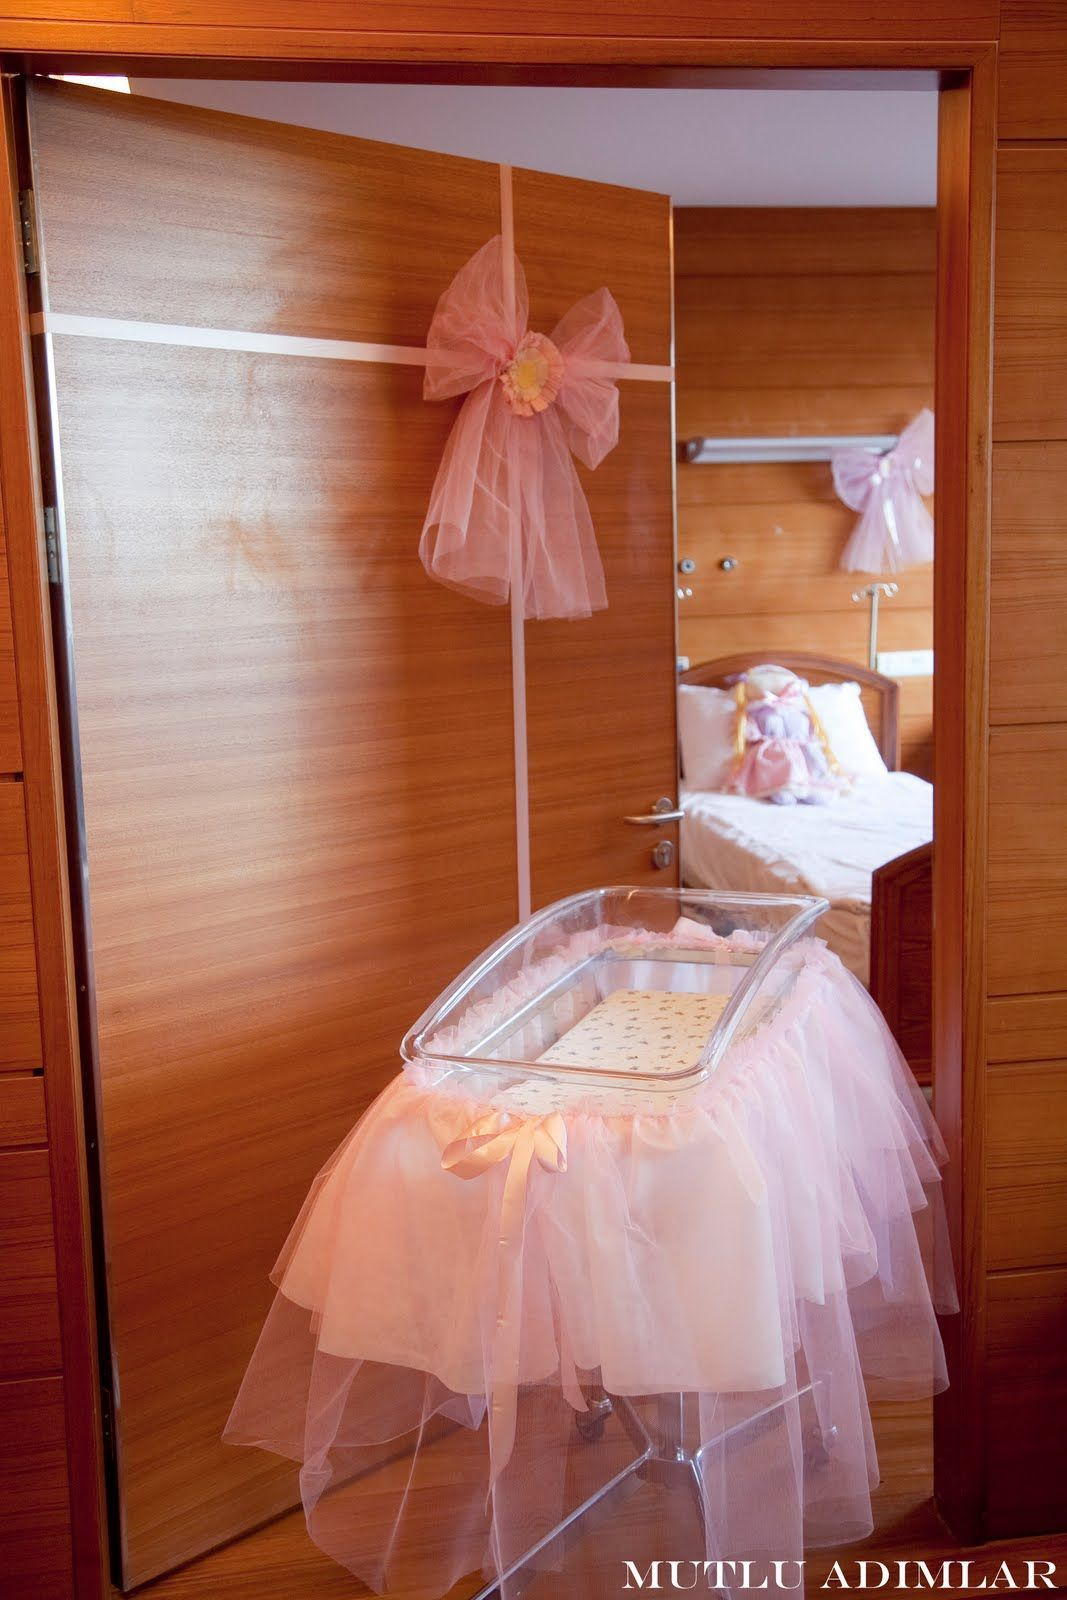 Photo of Cradle decoration materials, how to decorate pregnant cradle?